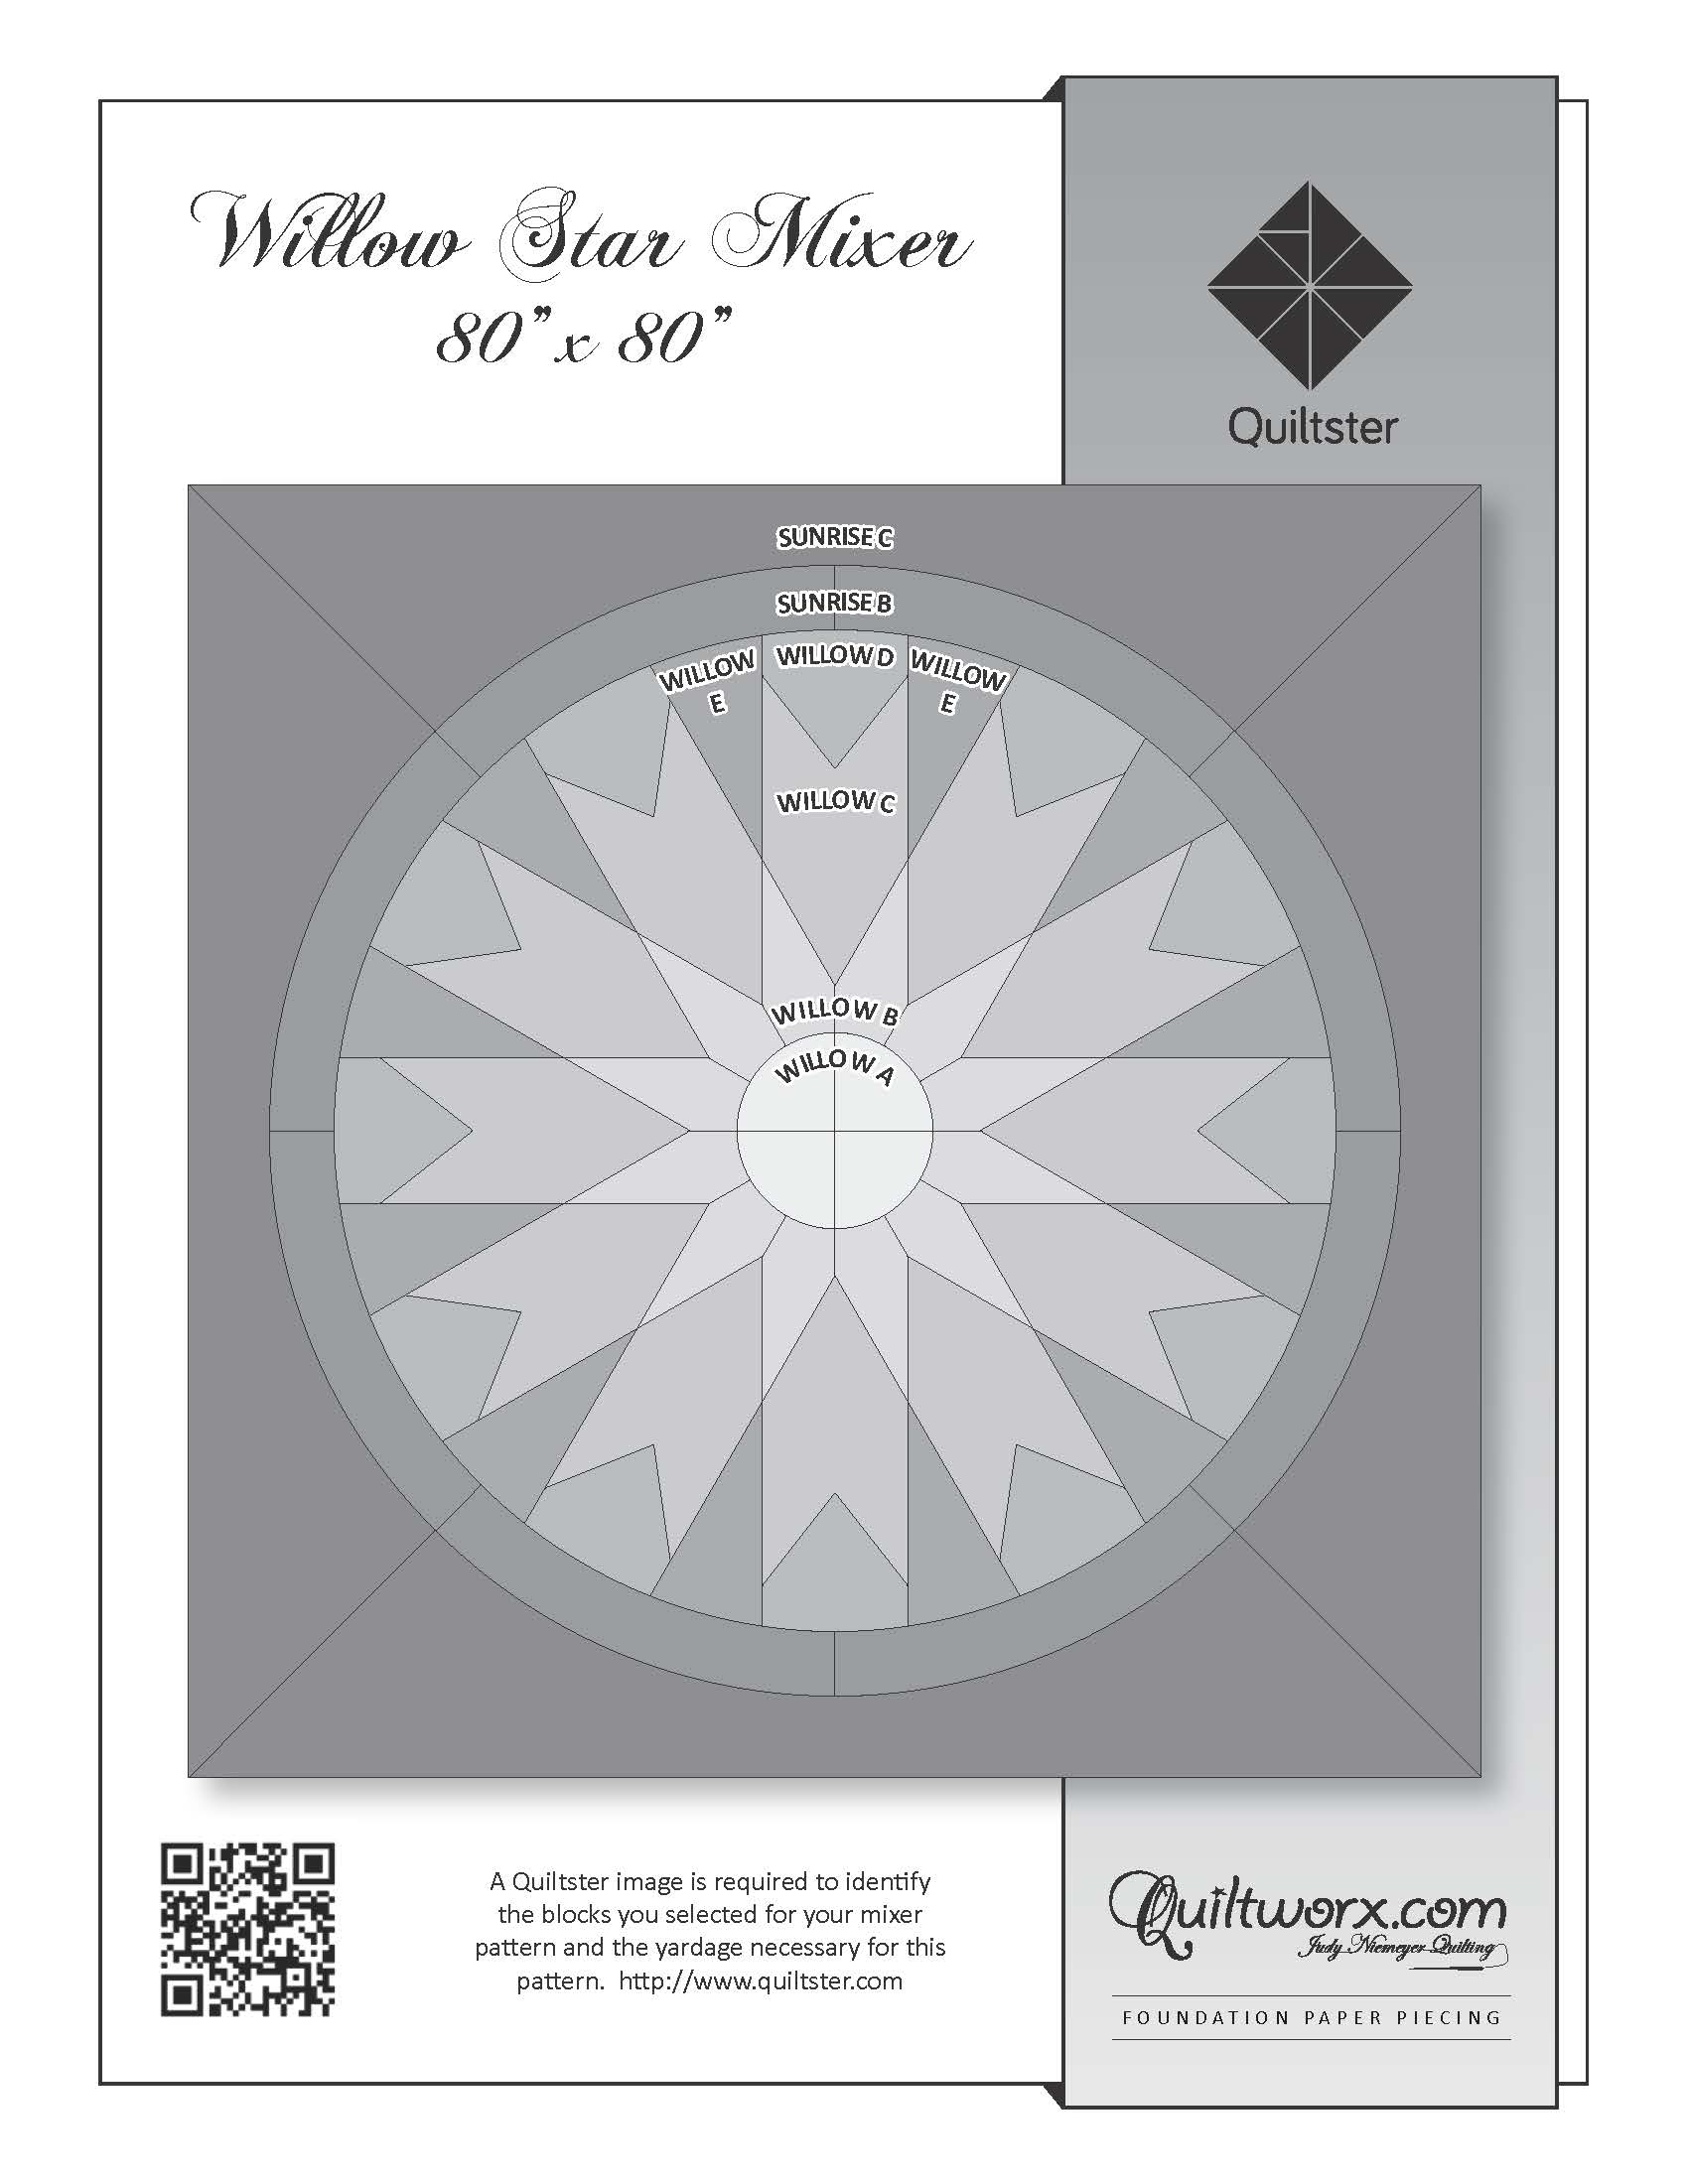 "Willow Star Mixer - 80"" x 80"""